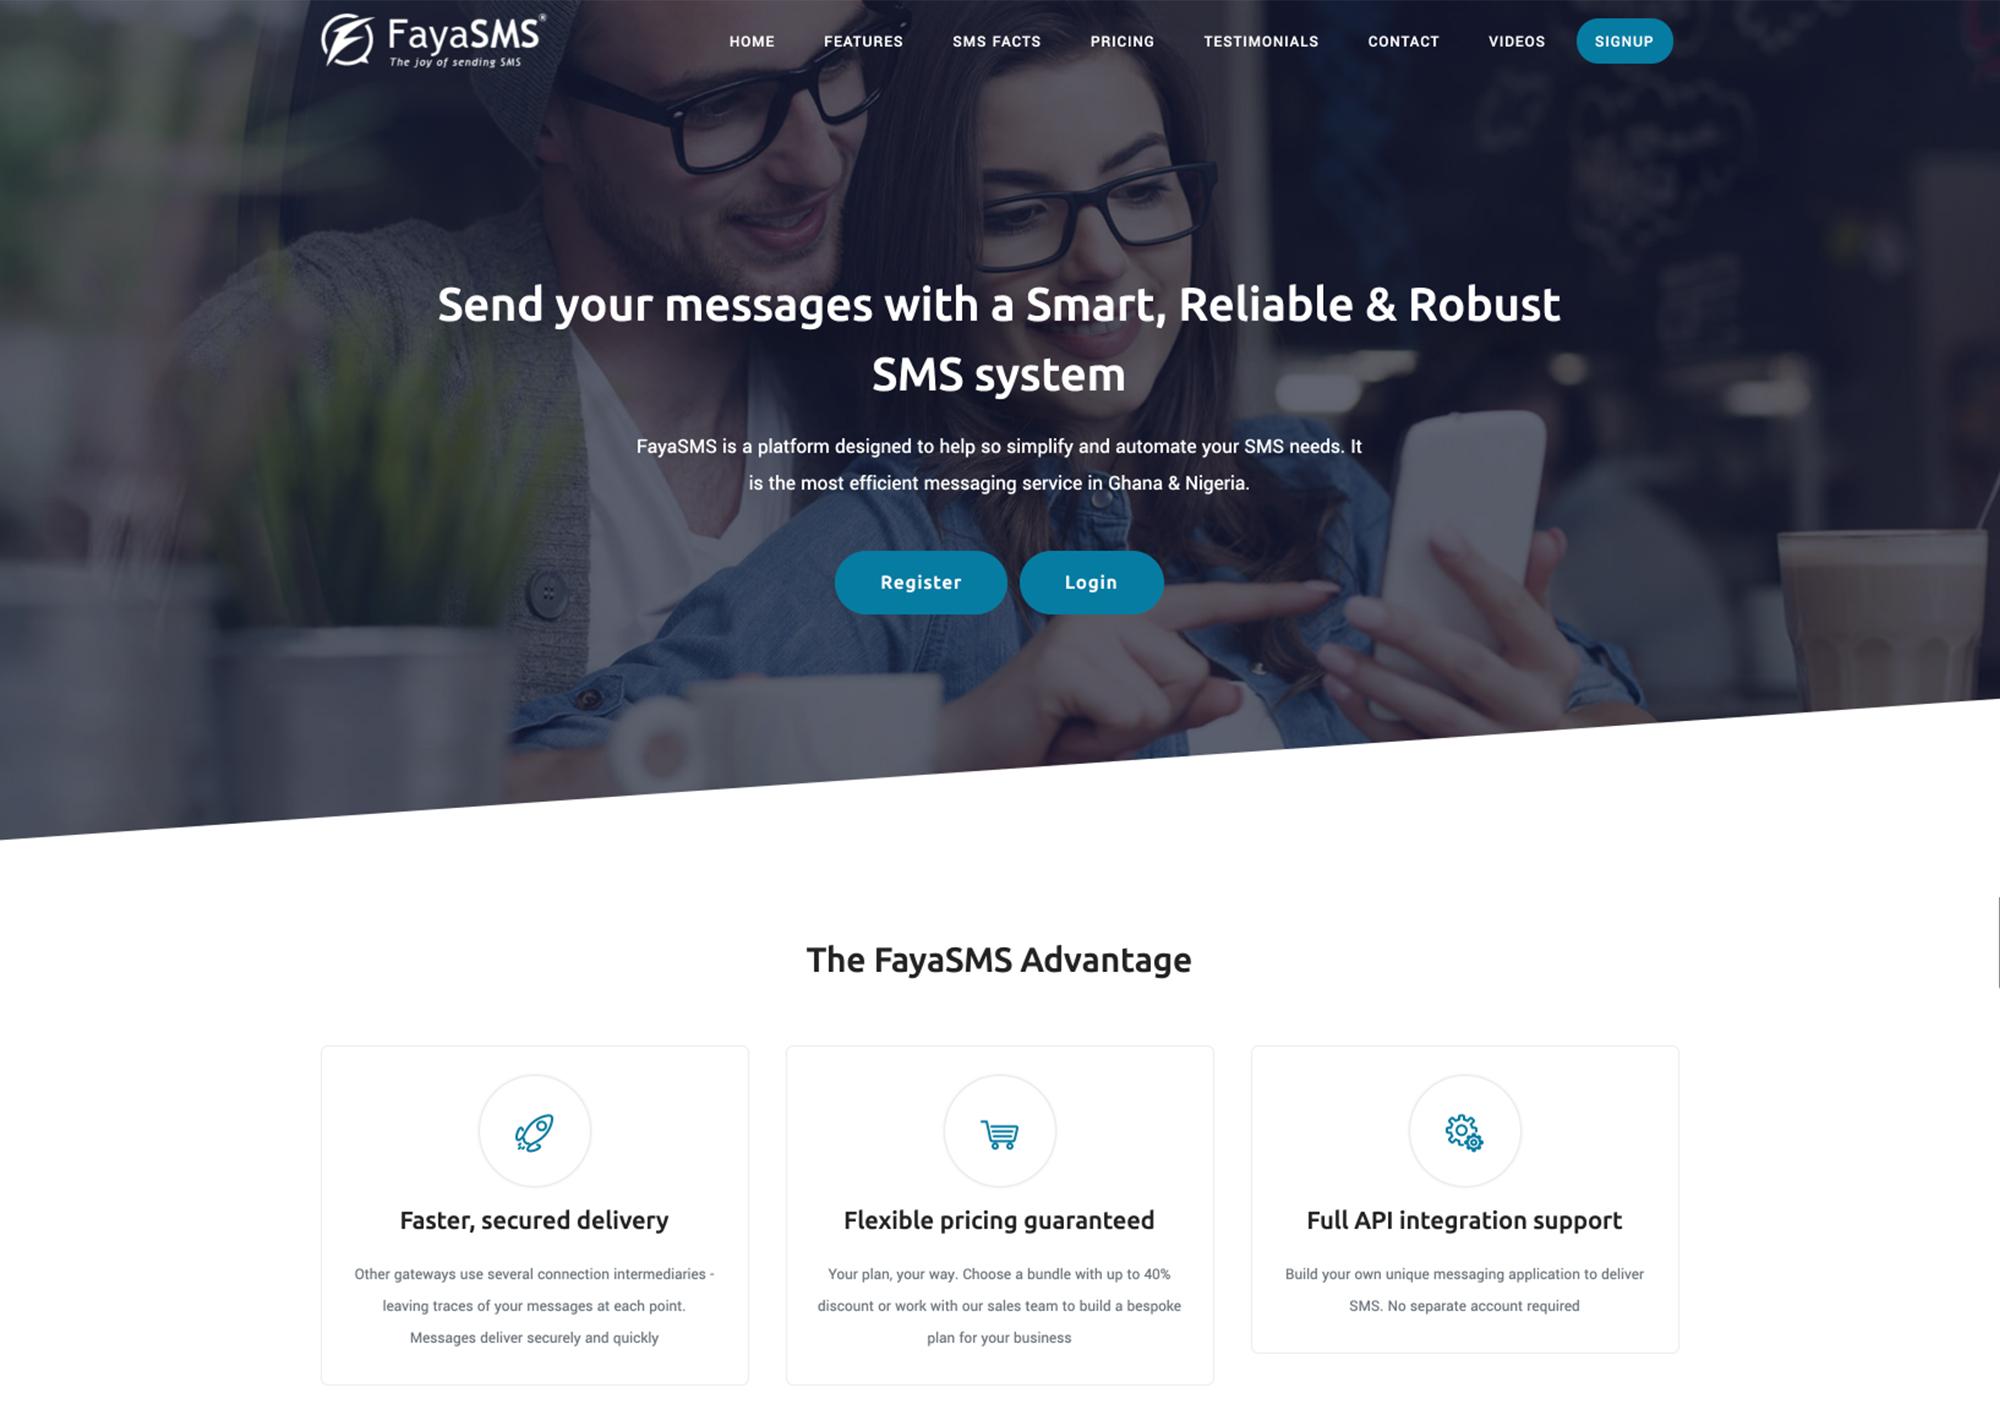 FayaSMS Website - Anchora Technologies